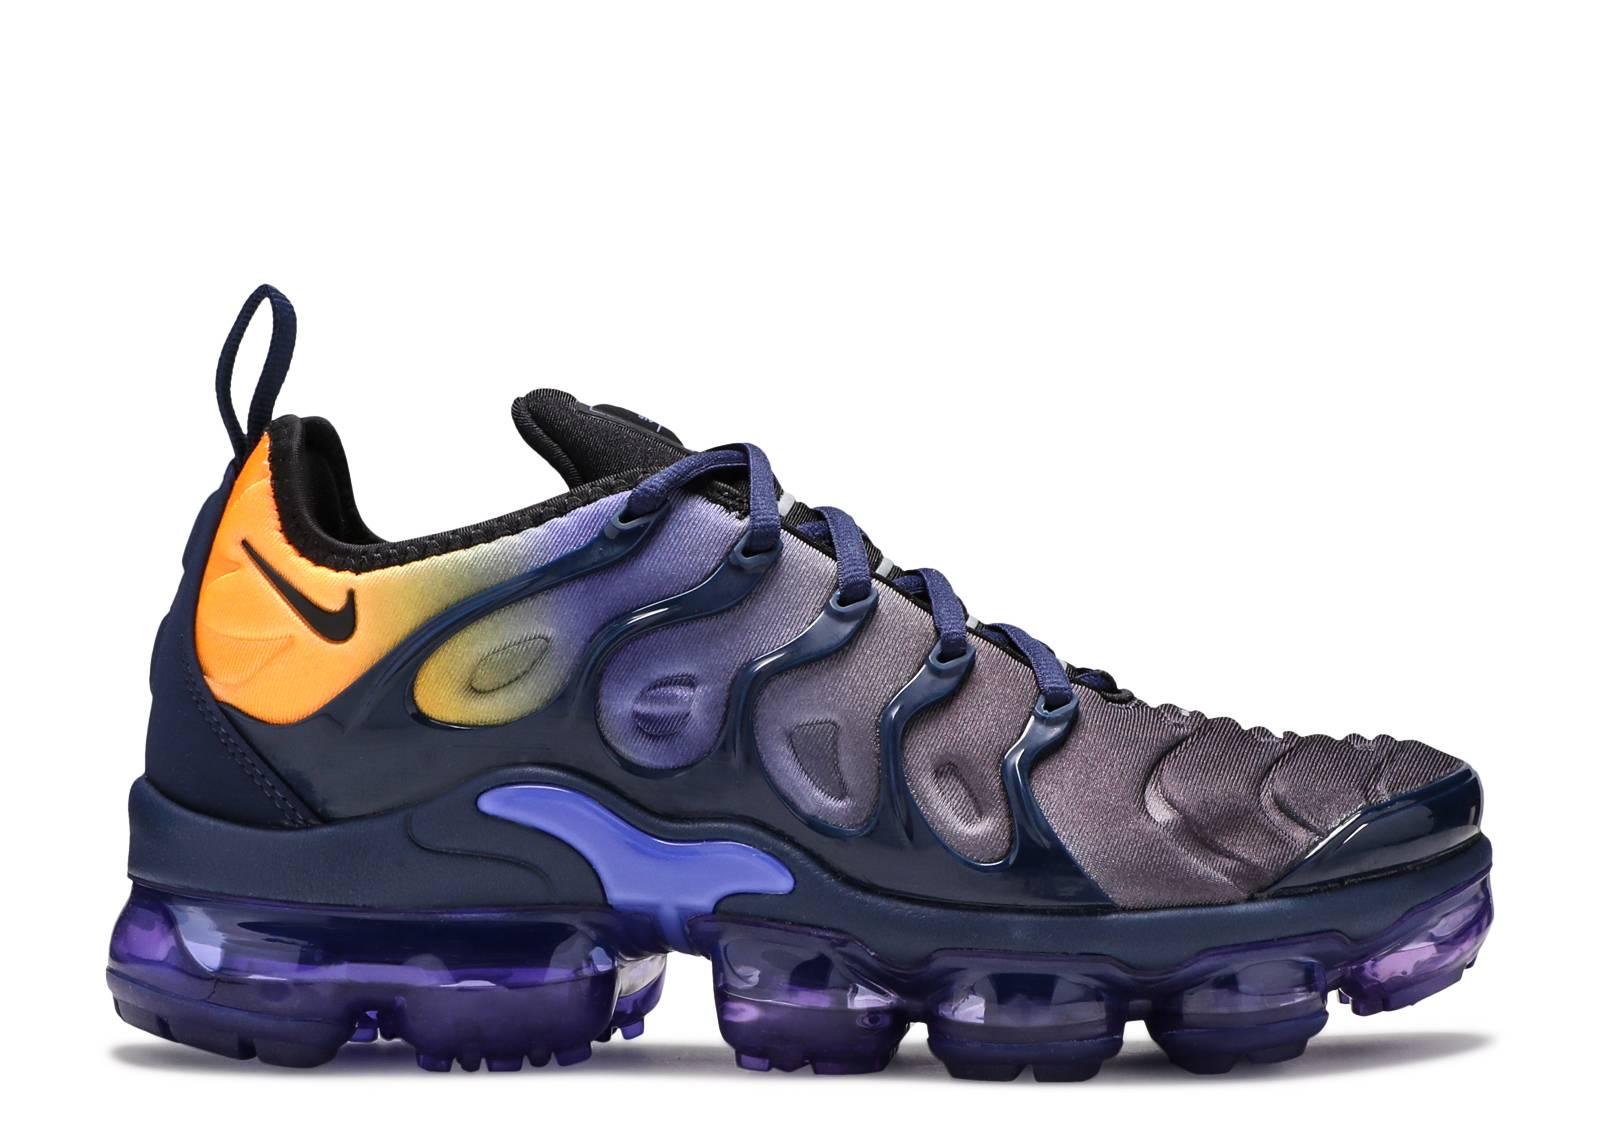 f474c848ef55e W s Nike Vapormax Plus - Nike - ao4550 500 - blue orange